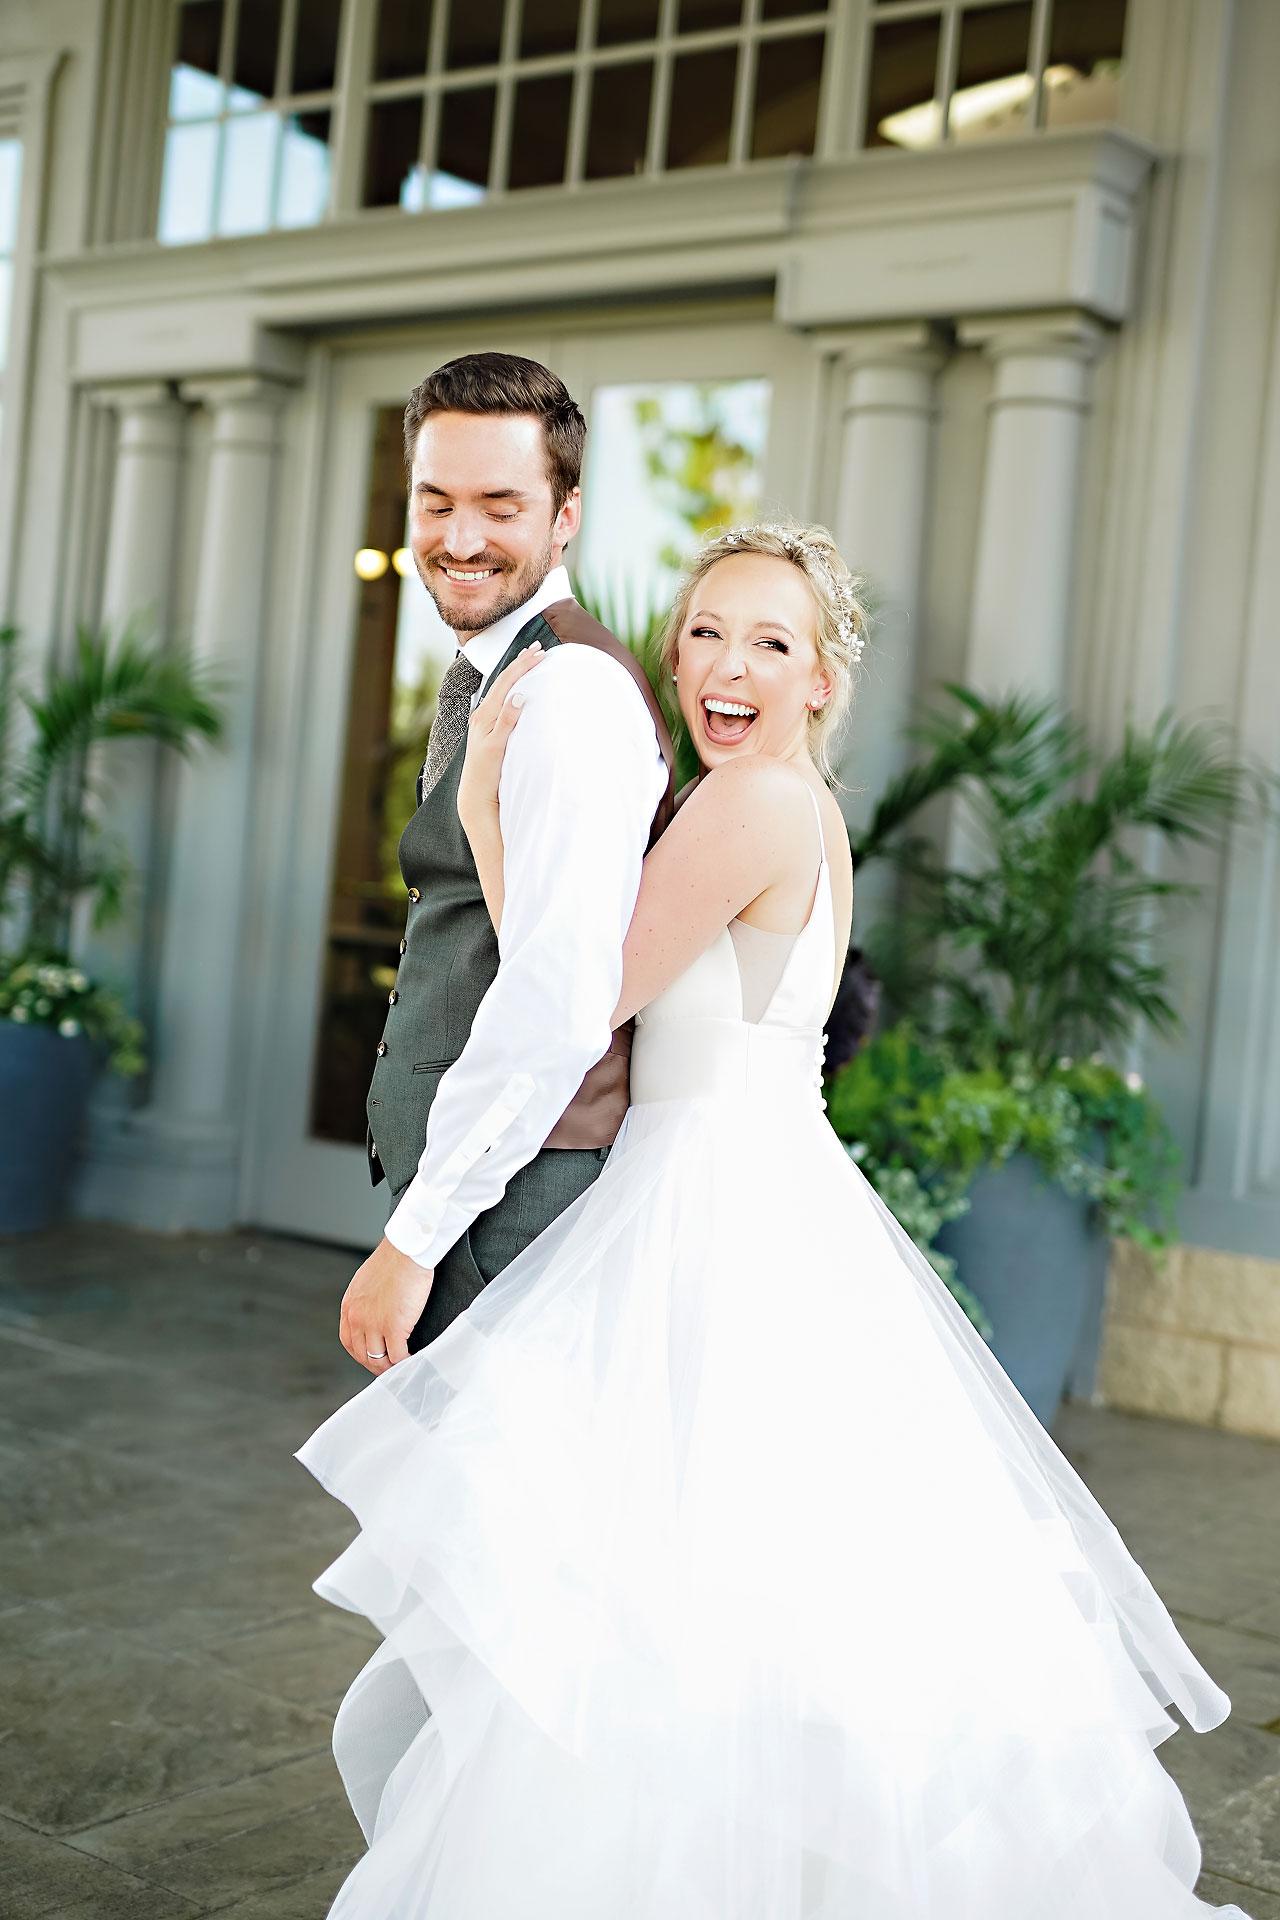 Brylie Jackson Ritz Charles Carmel Indiana Wedding Reception 031